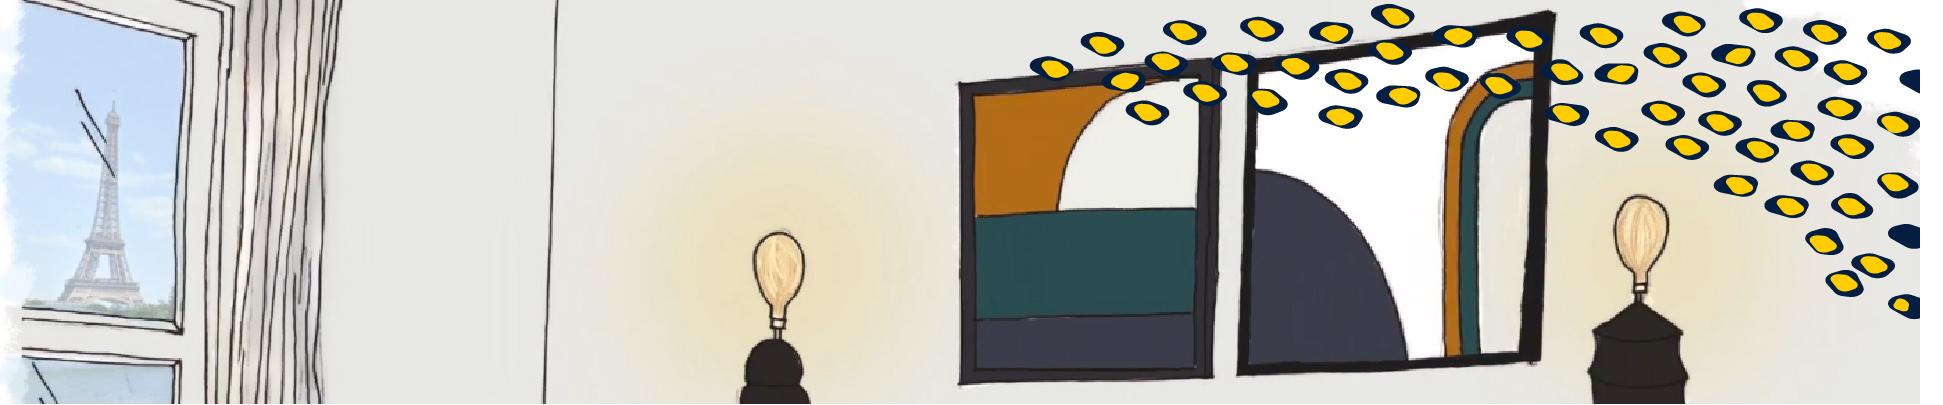 peinture-design-ampoules